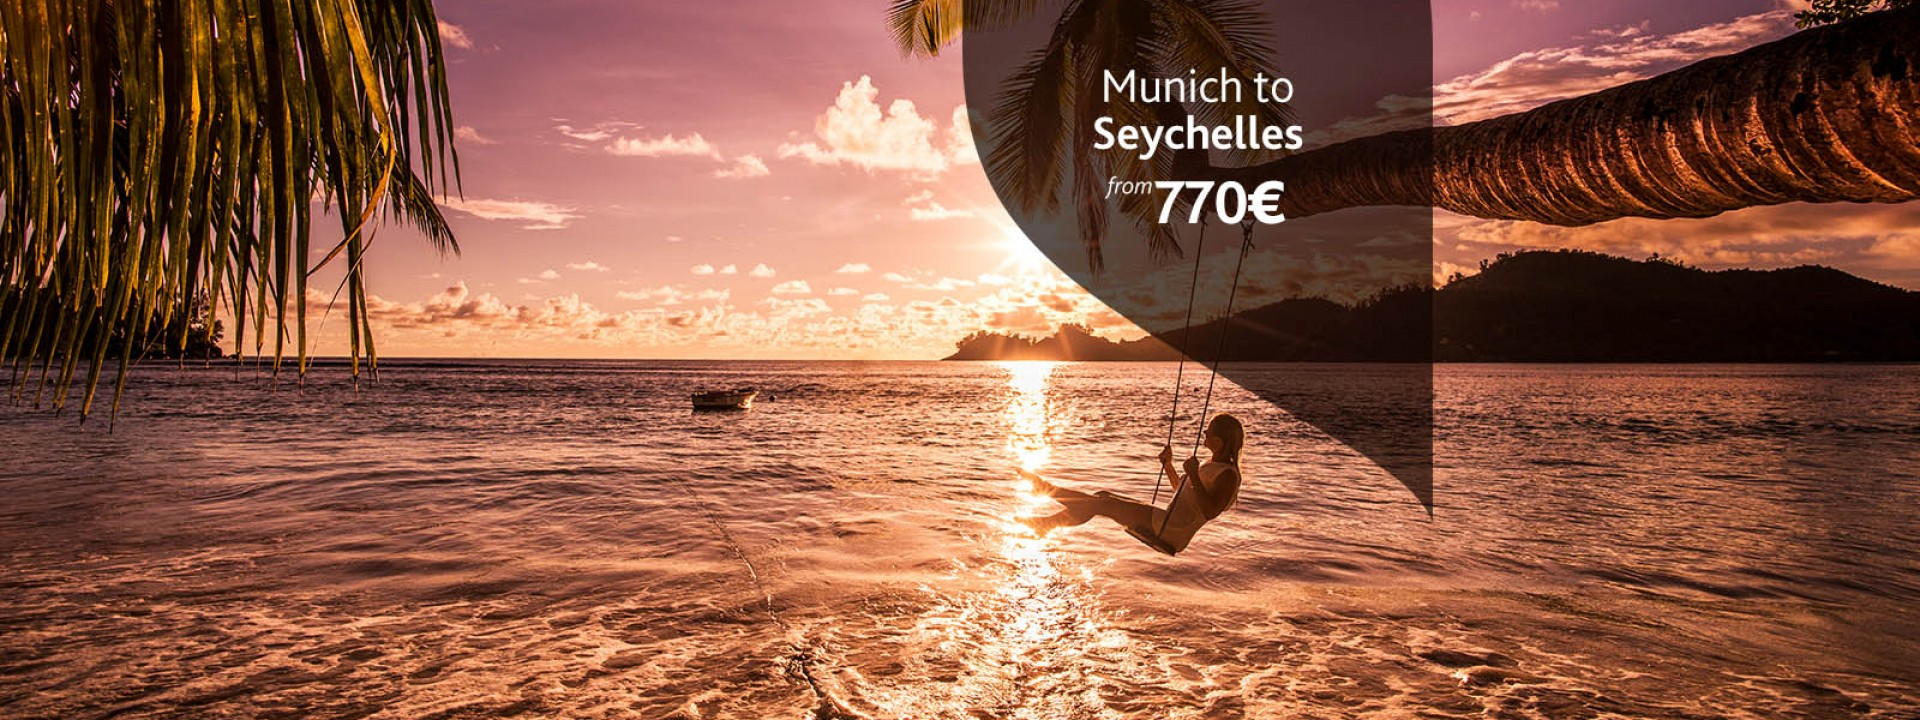 flights-from-munich-to-mahe-seychelles-economy